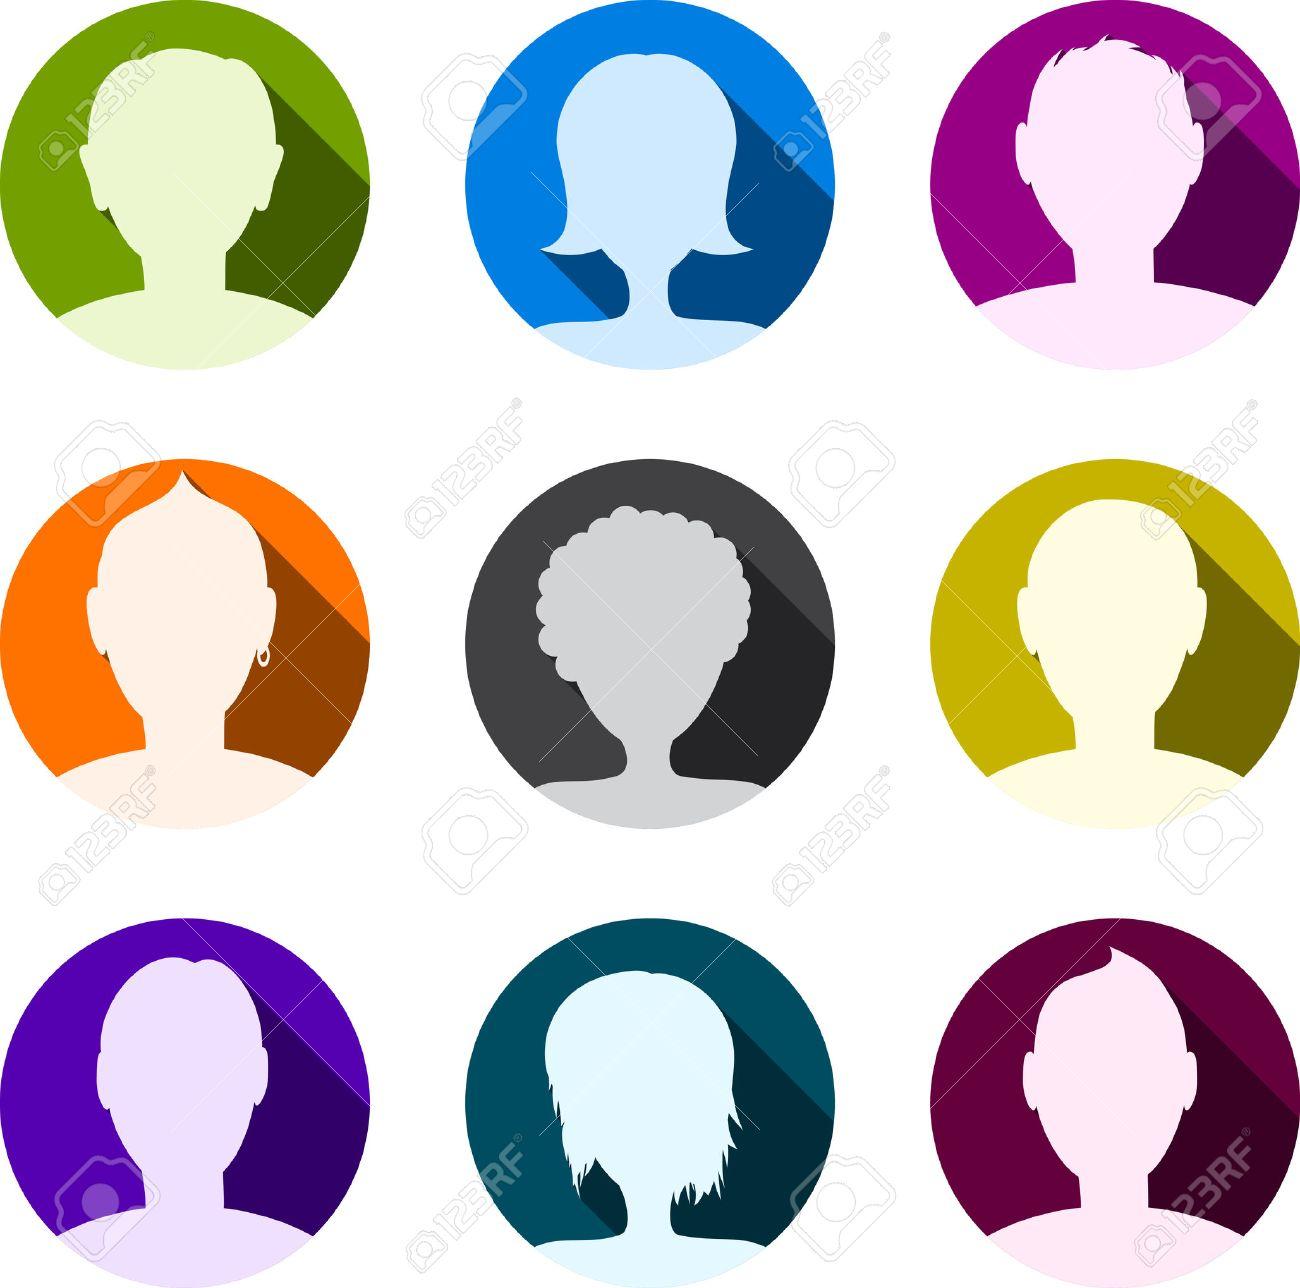 people icon set person symbols vector illustration royalty free rh 123rf com